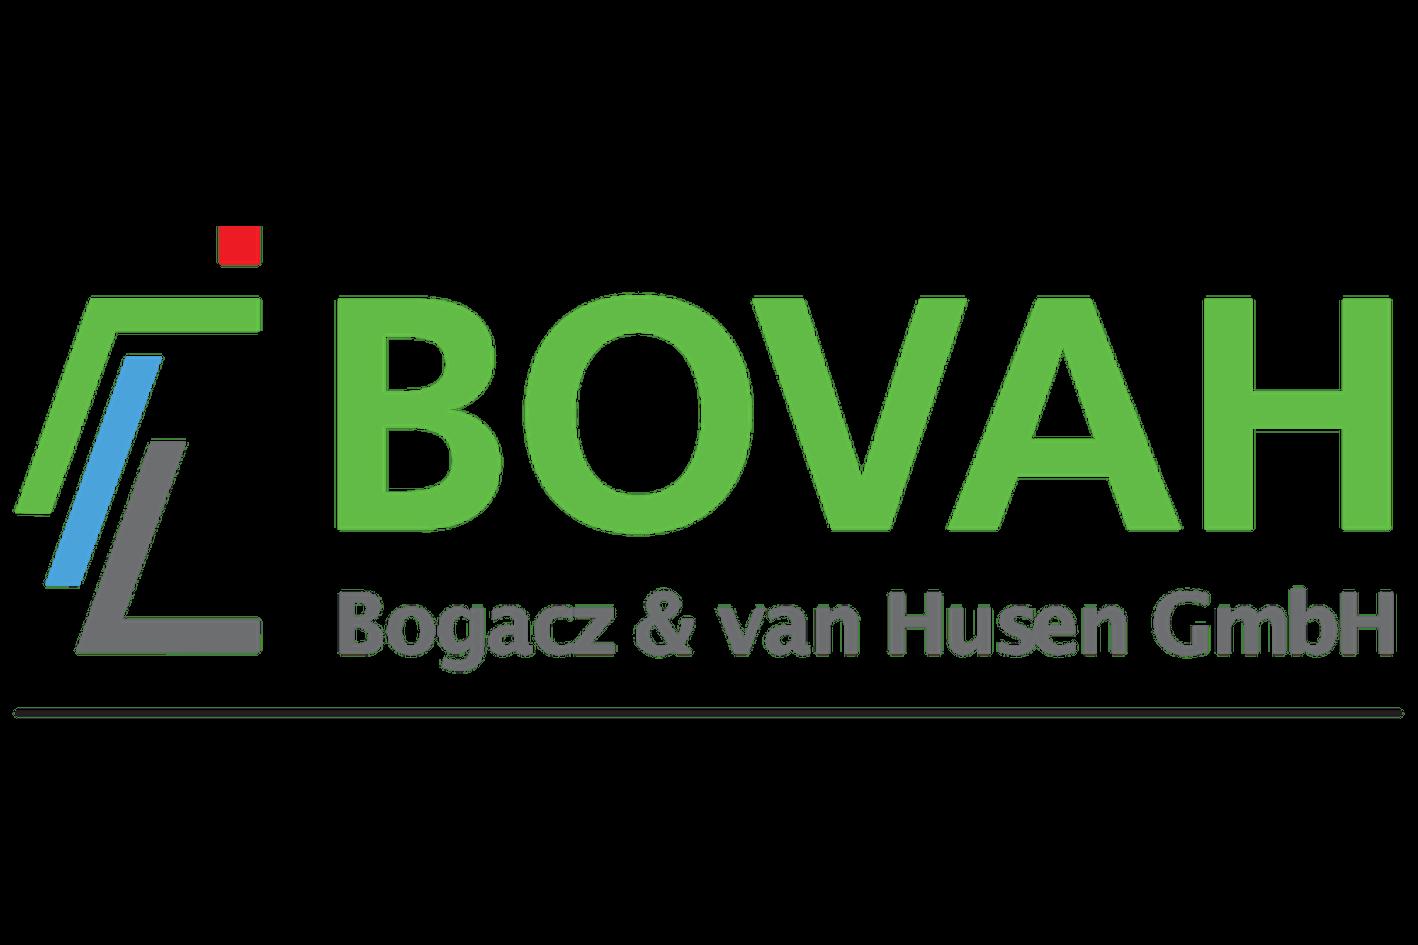 Altay Werbung Partner - BOVAH Bogacz und van Husen GmbH